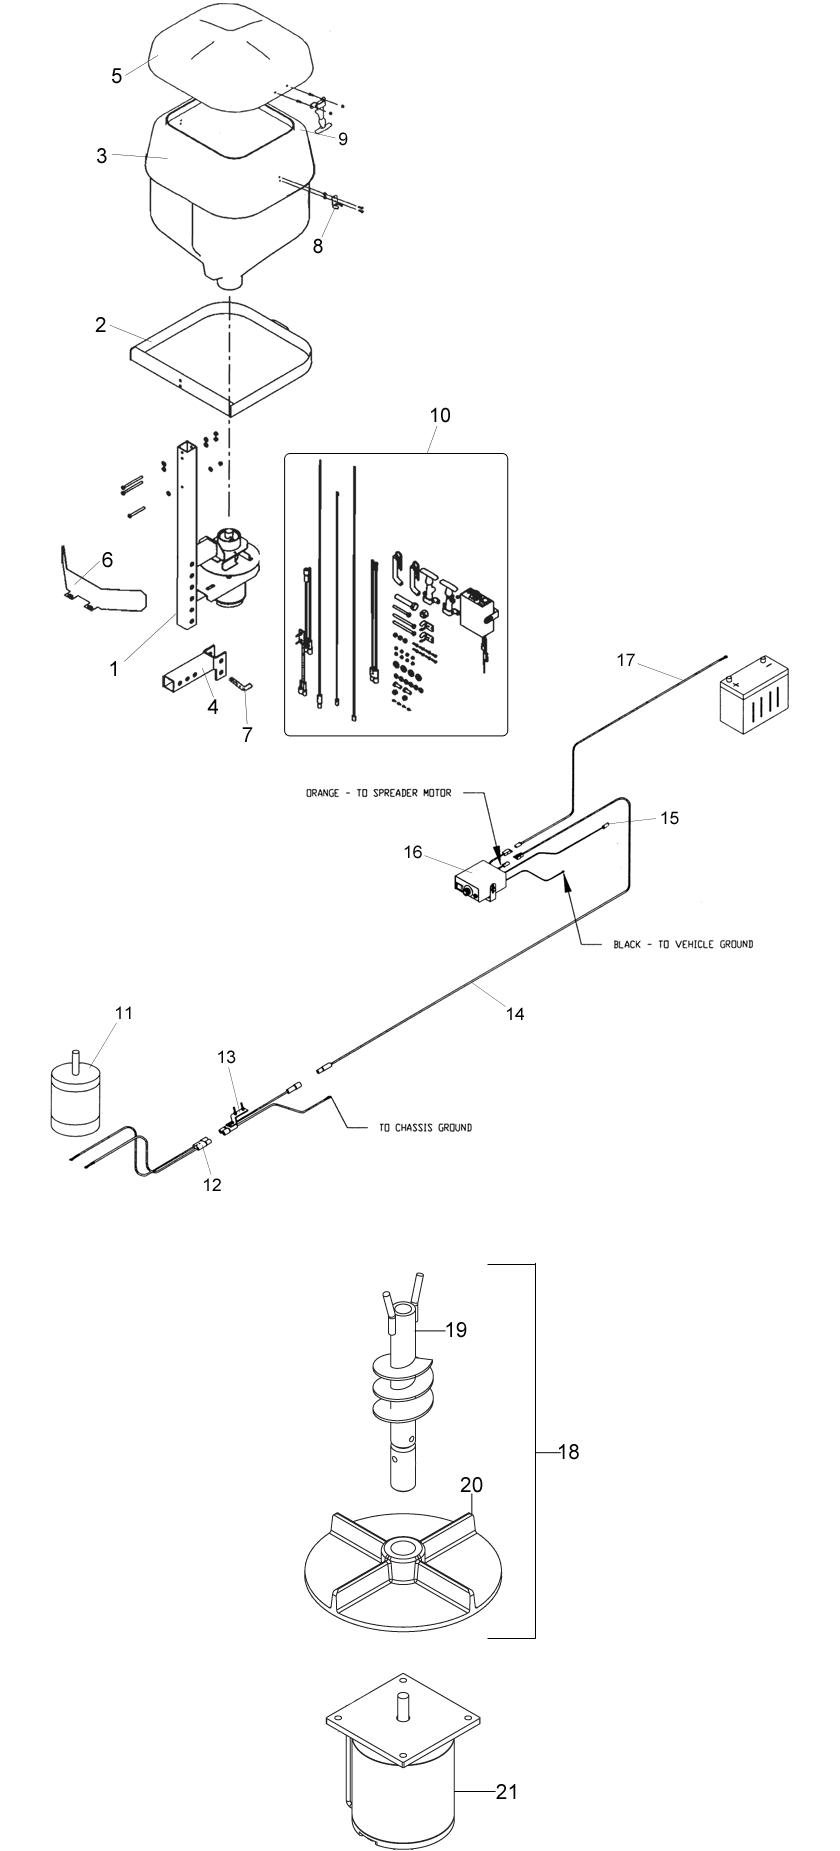 Western tornado Salt Spreader Wiring Diagram Western tornado Spreader Wiring Diagram Wiring Library